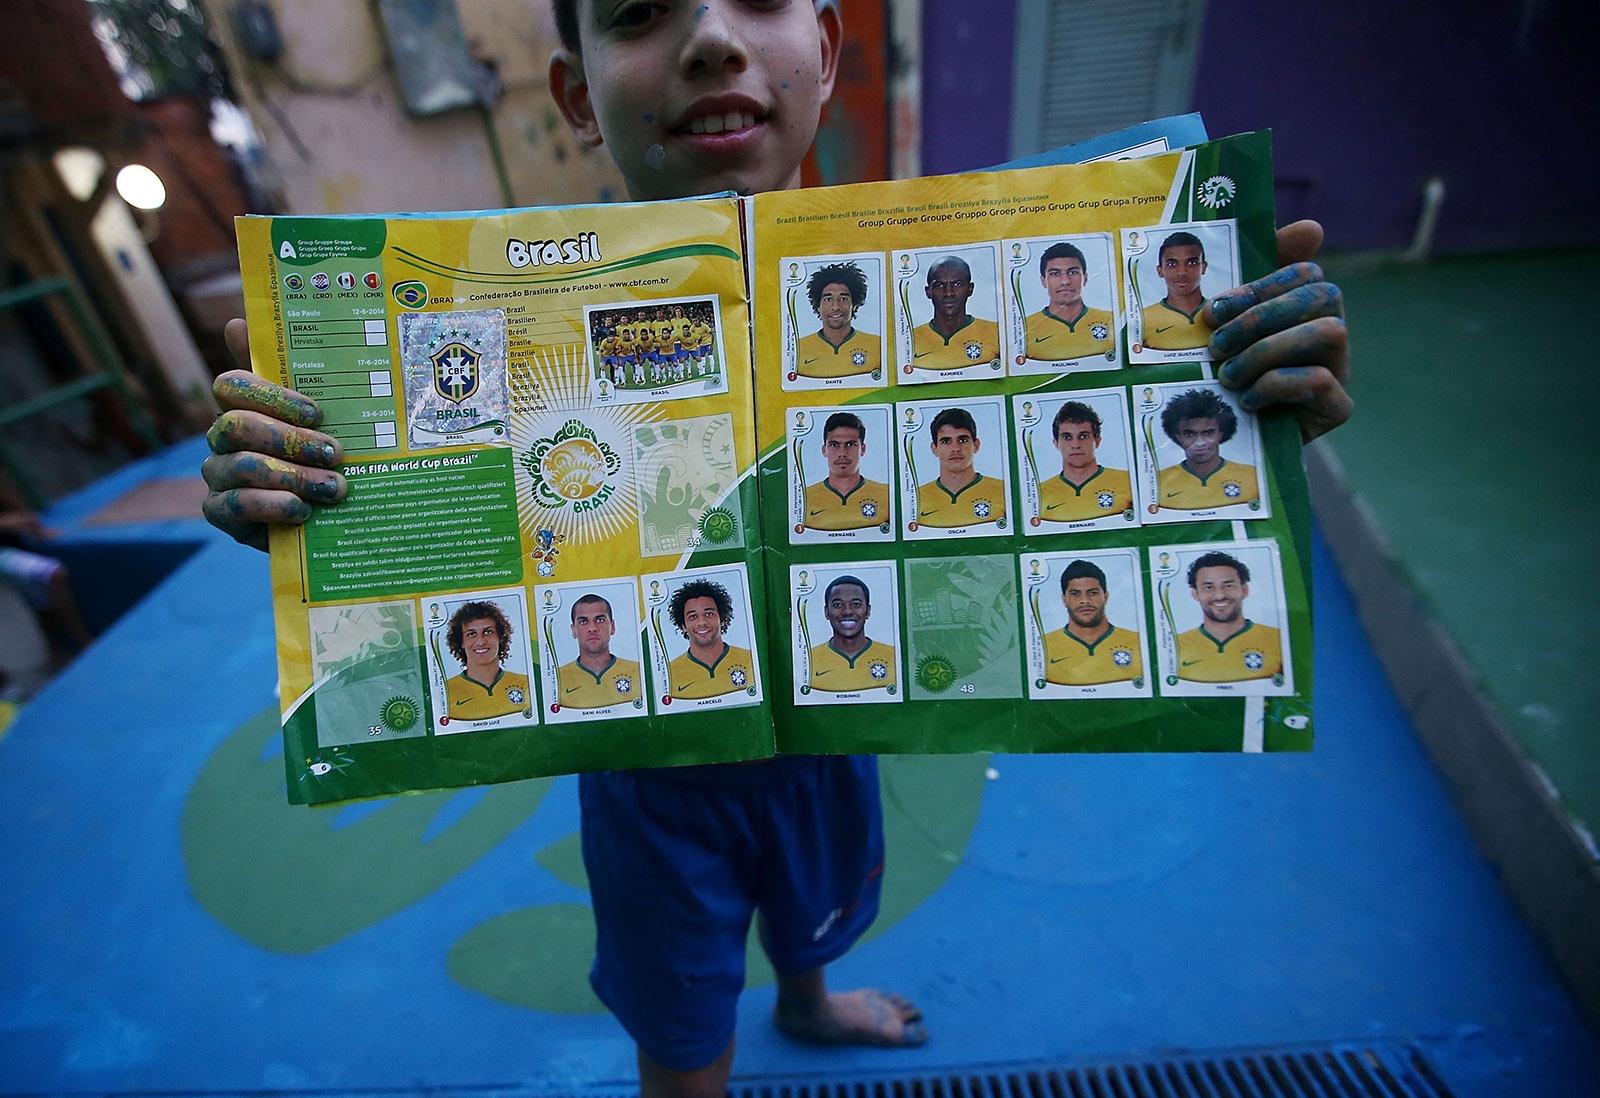 Seleta de legumes hortifruti a boy from santa marta favela with his panini world cup sticker book rio de janeiro brazil 2014 photo by mario tamagetty images fandeluxe Gallery